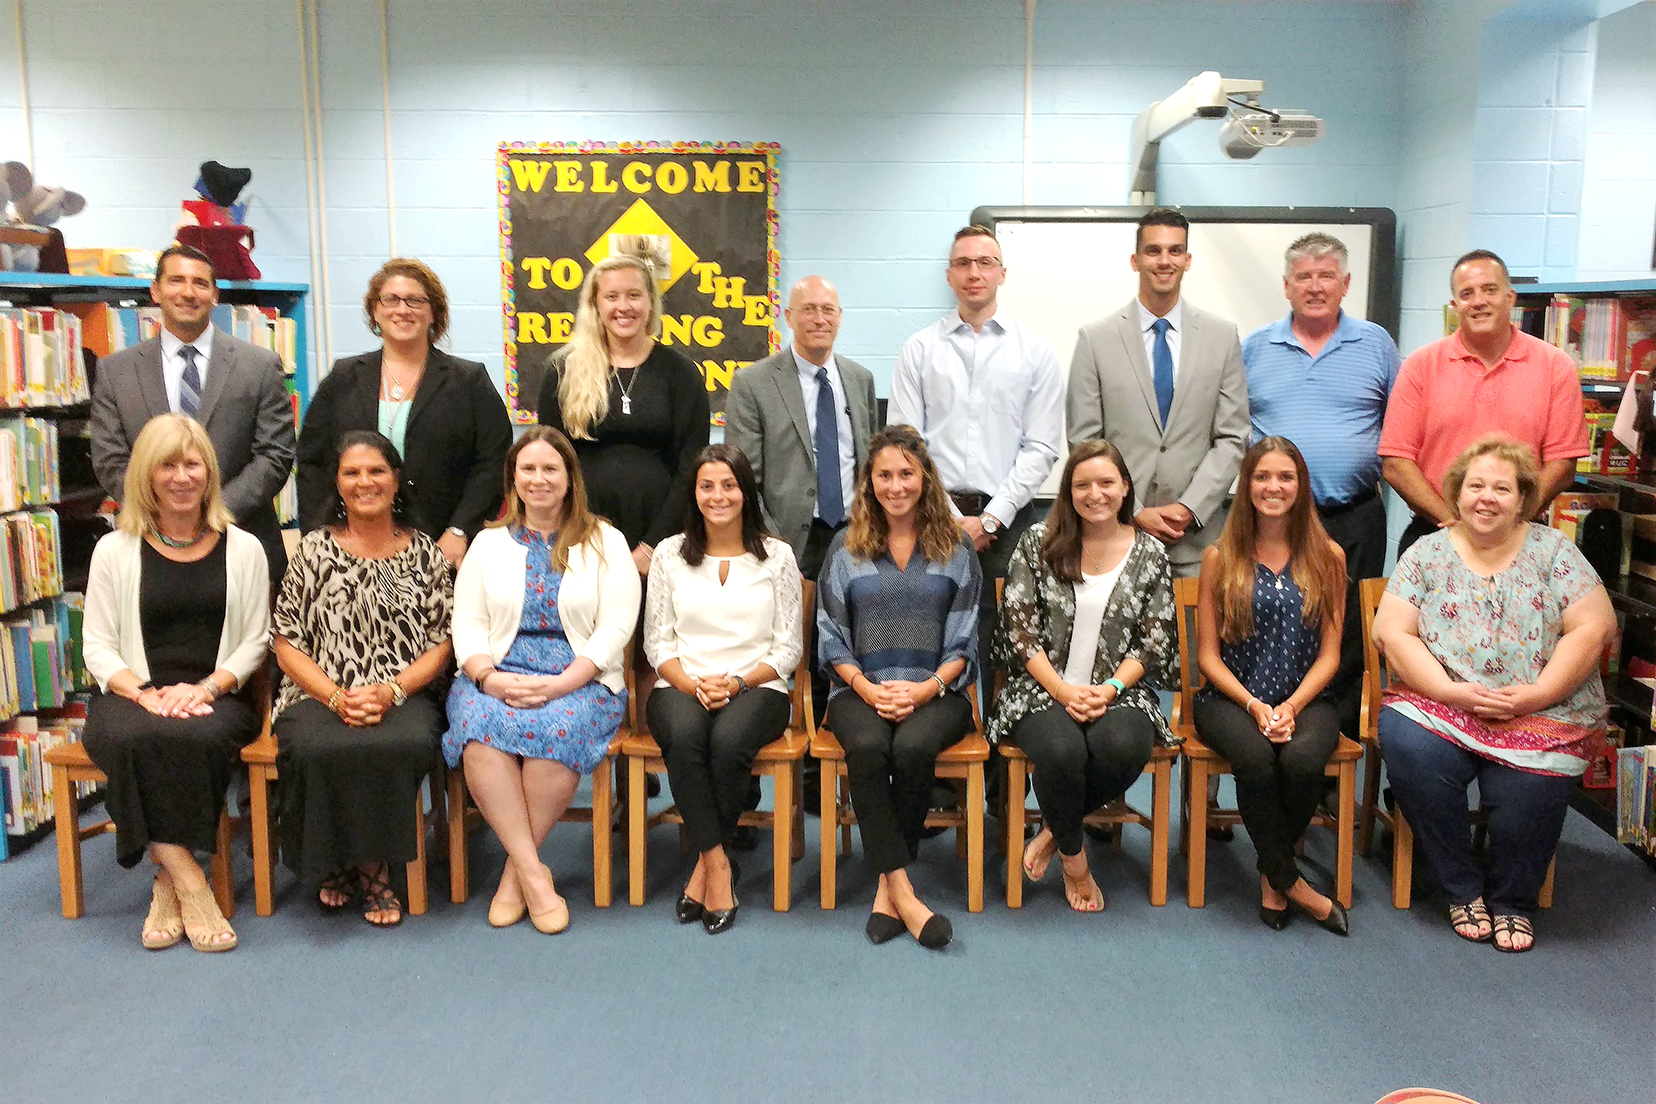 2 New Stem Teachers Join Secaucus Middle School Staff